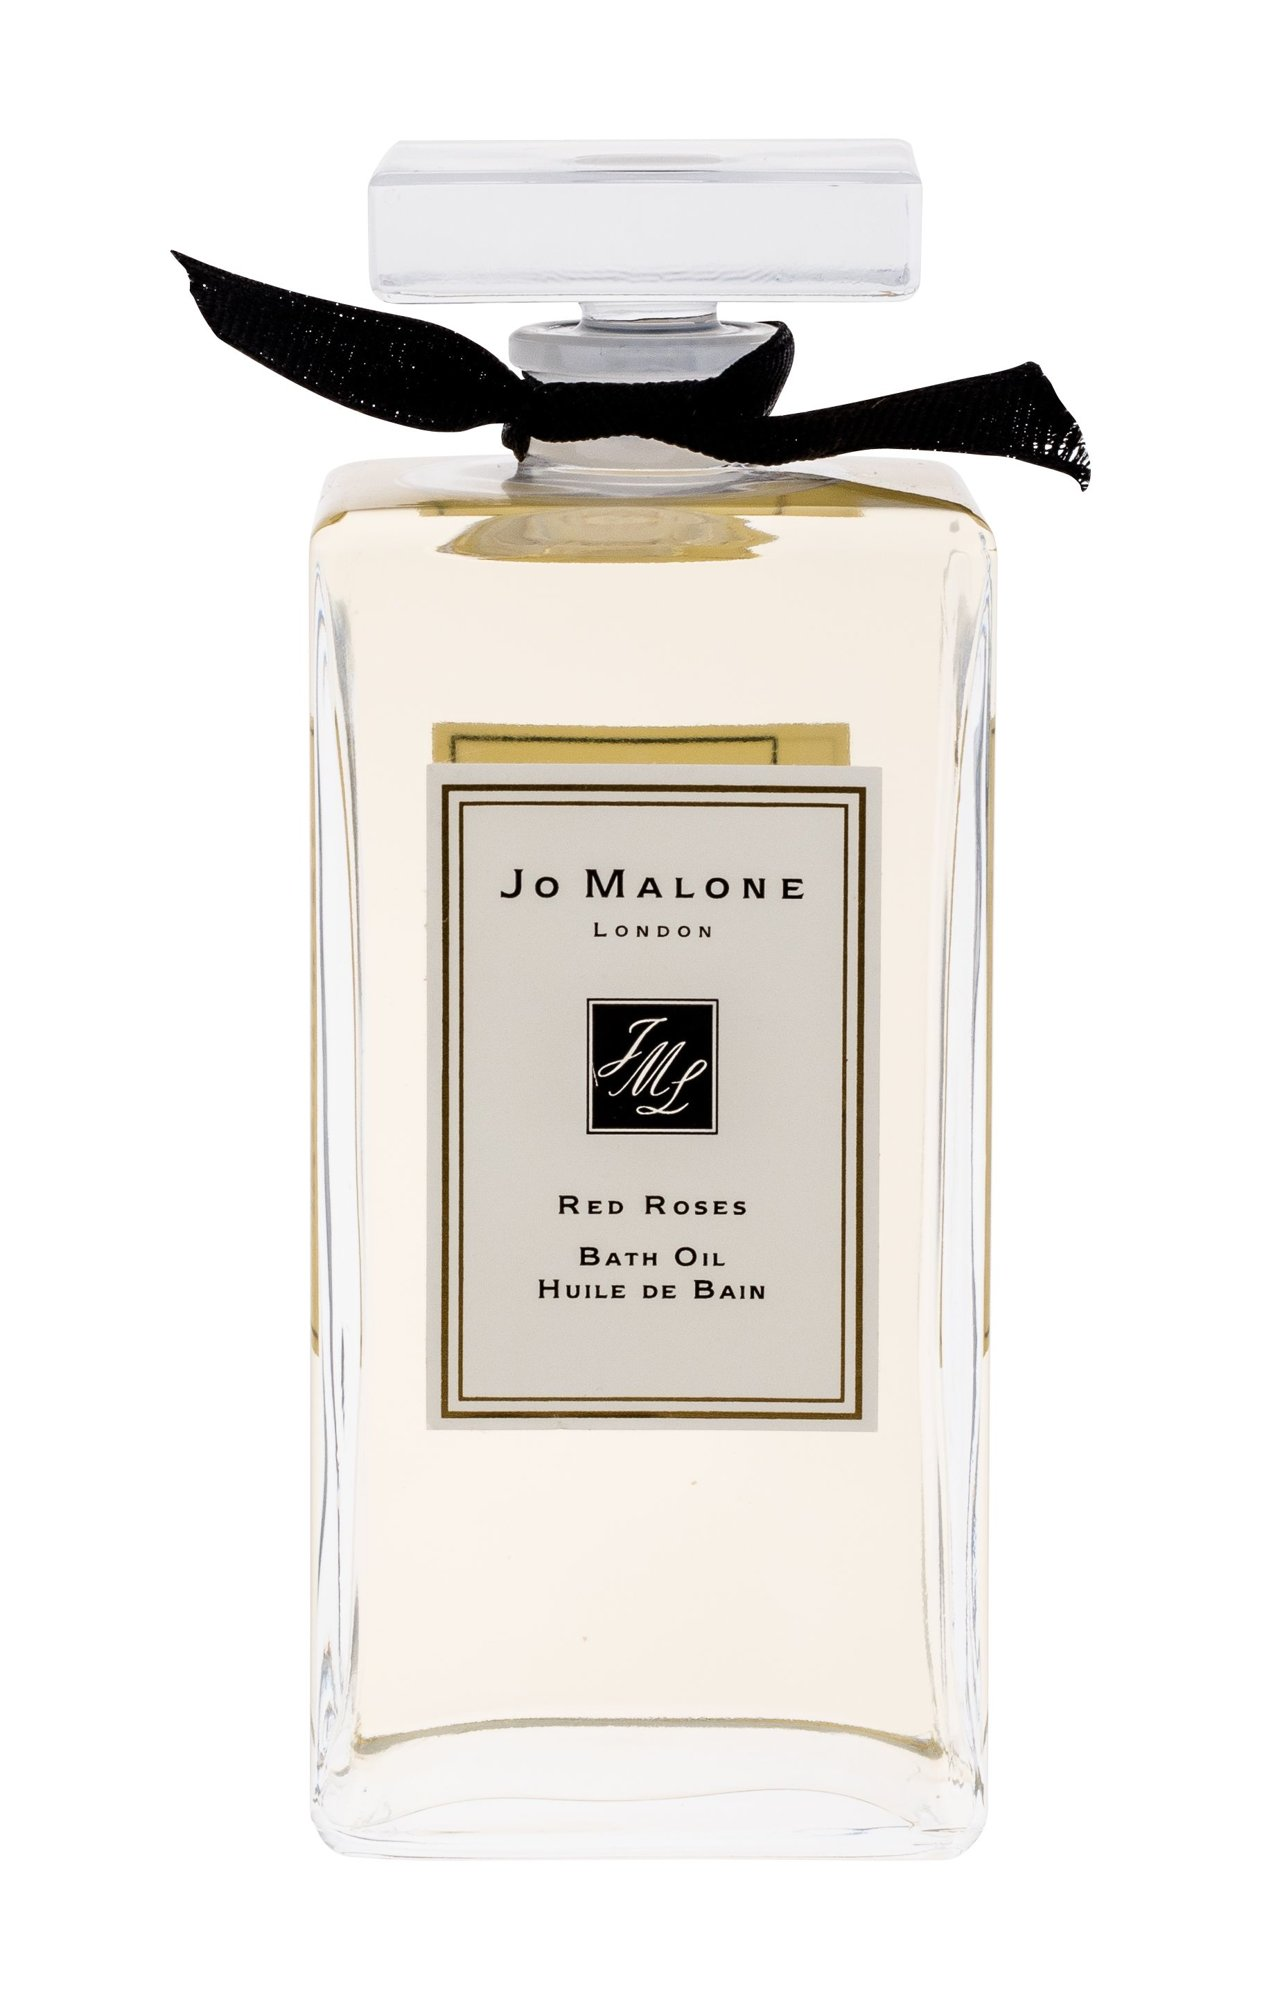 Jo Malone Red Roses Shower Oil 200ml